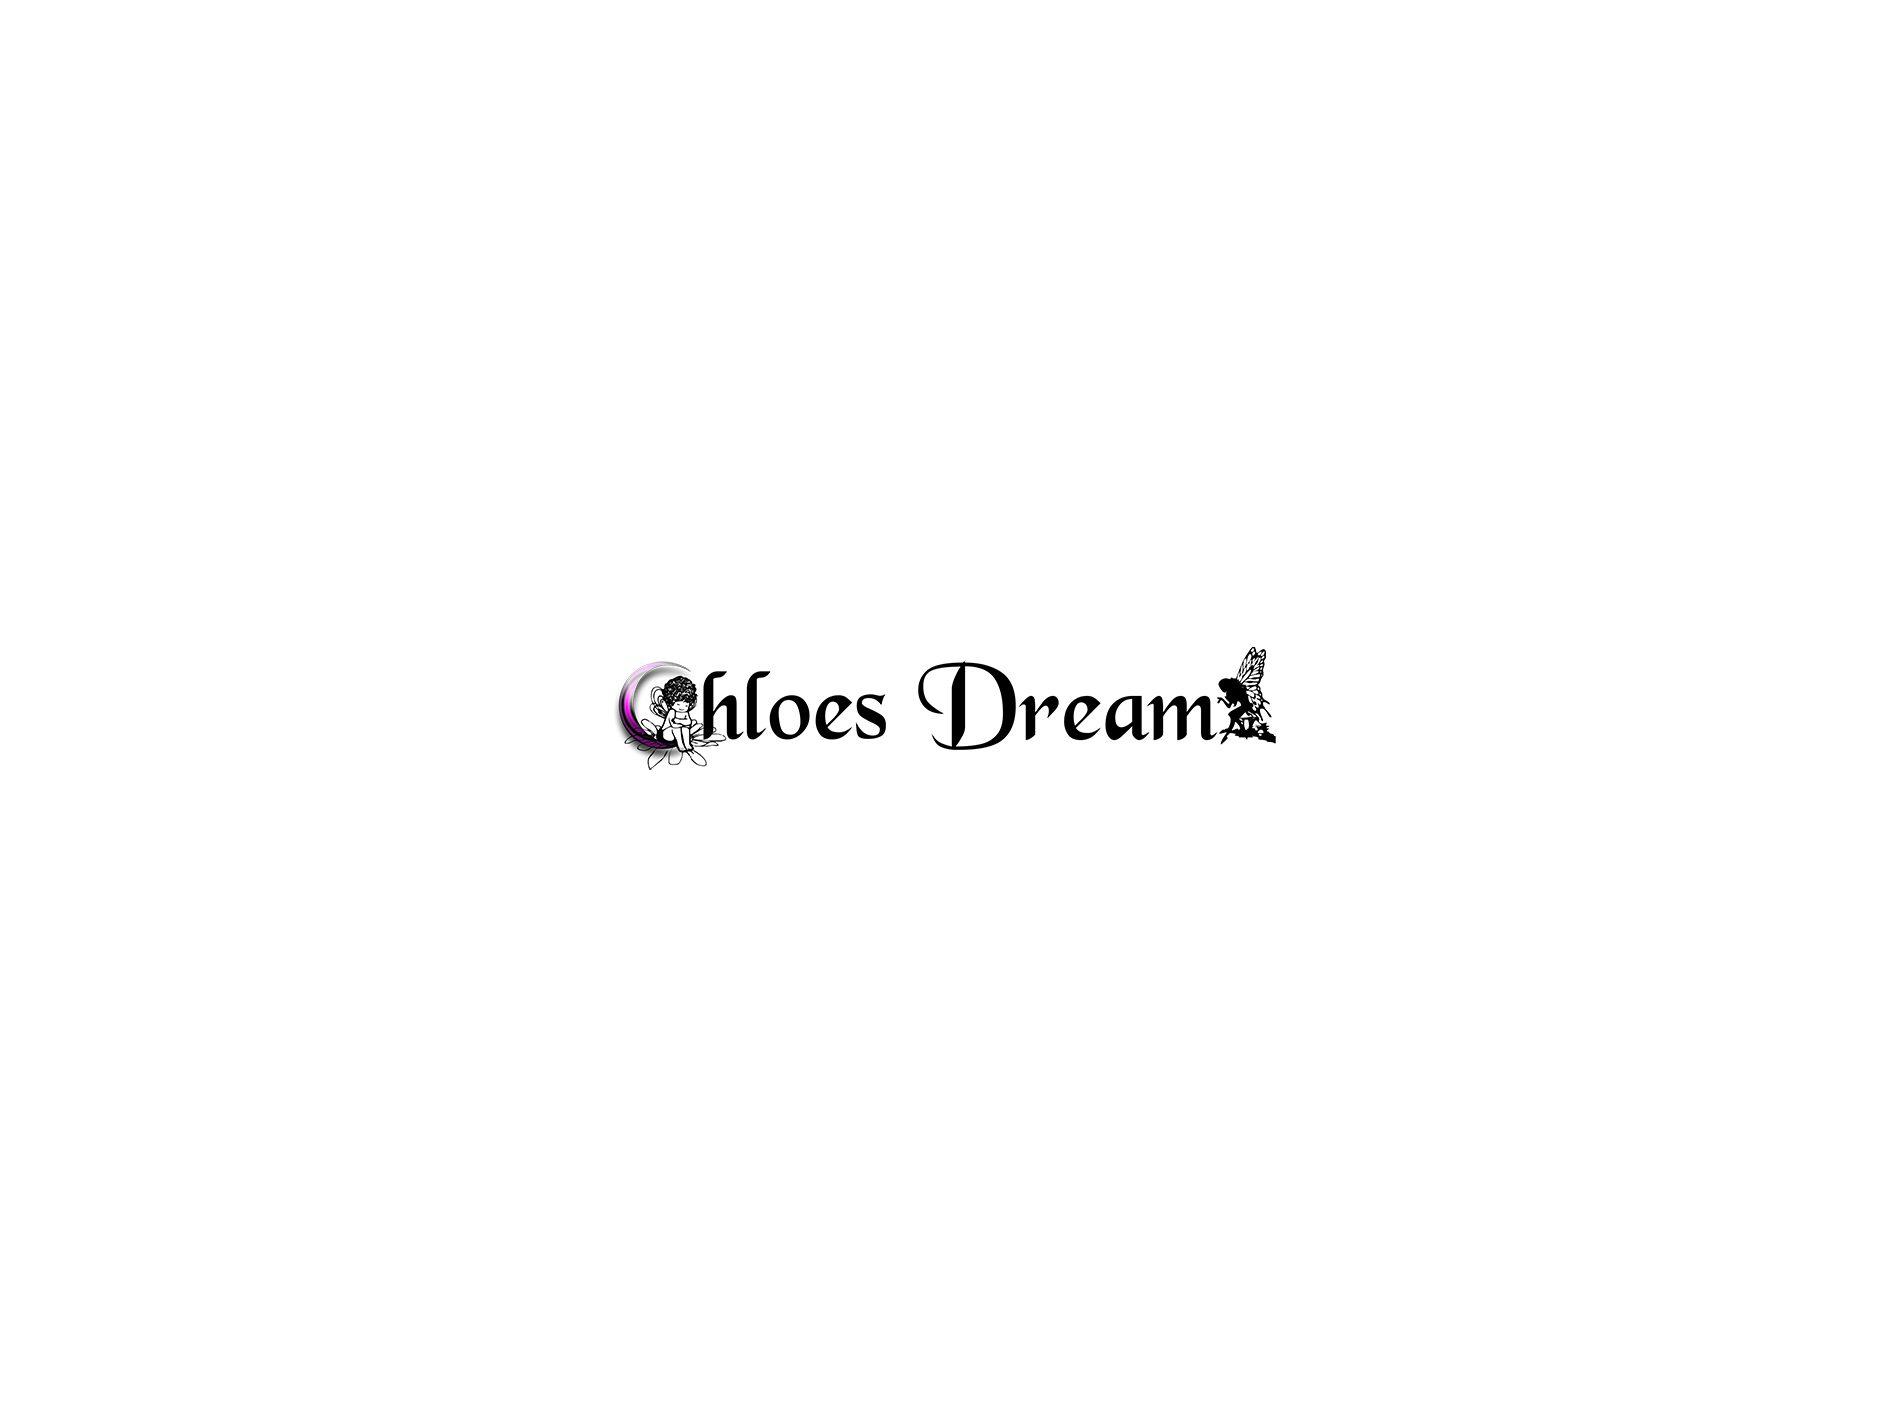 Chloesdream